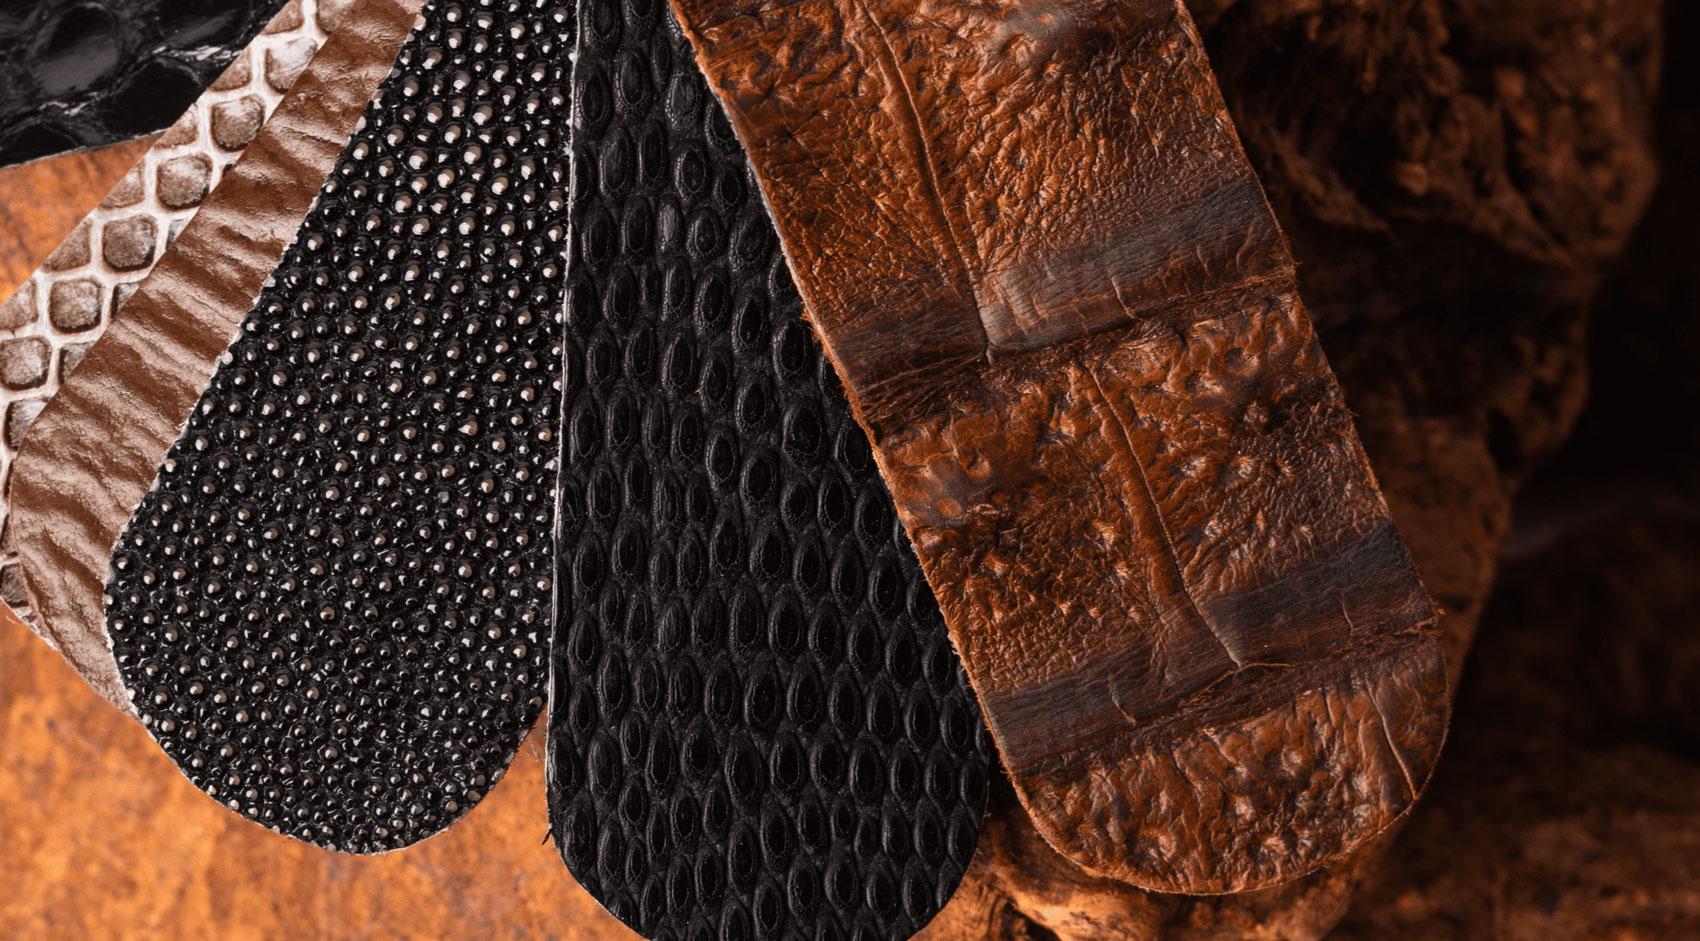 detalles de pieles exóticas muestras